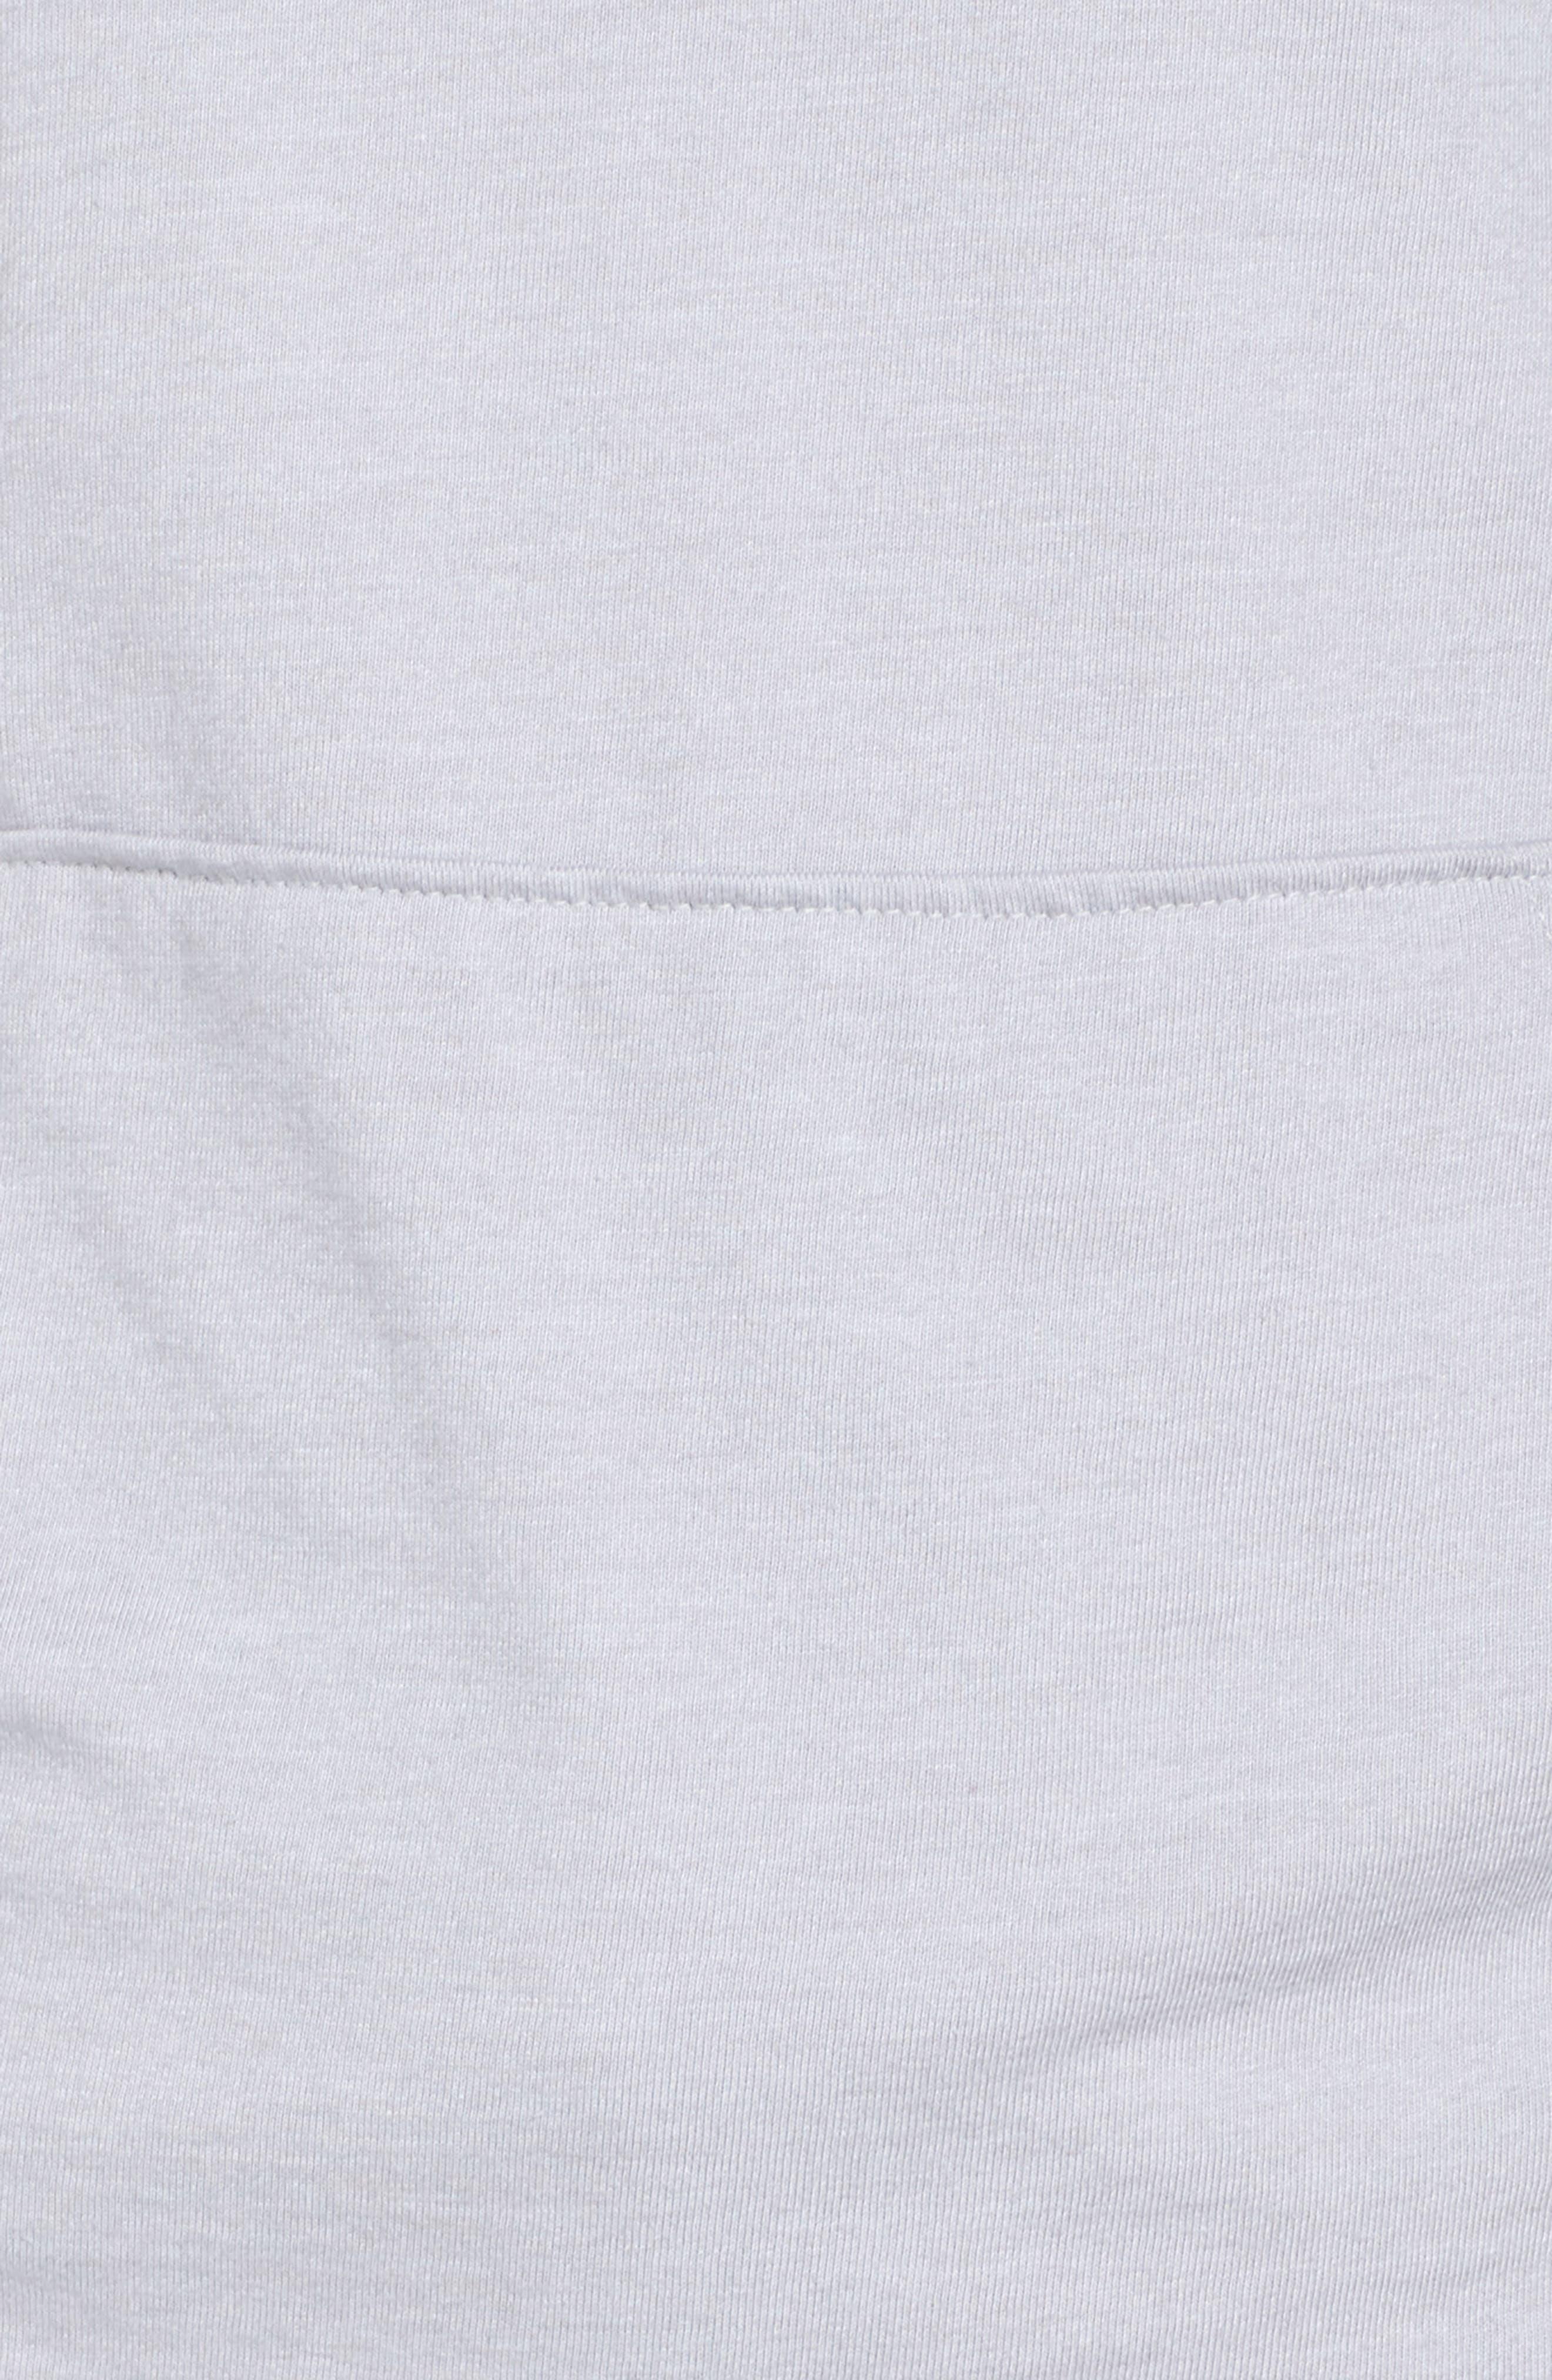 Lightweight Hoodie Sweatshirt,                             Alternate thumbnail 7, color,                             TNF LIGHT GREY HEATHER